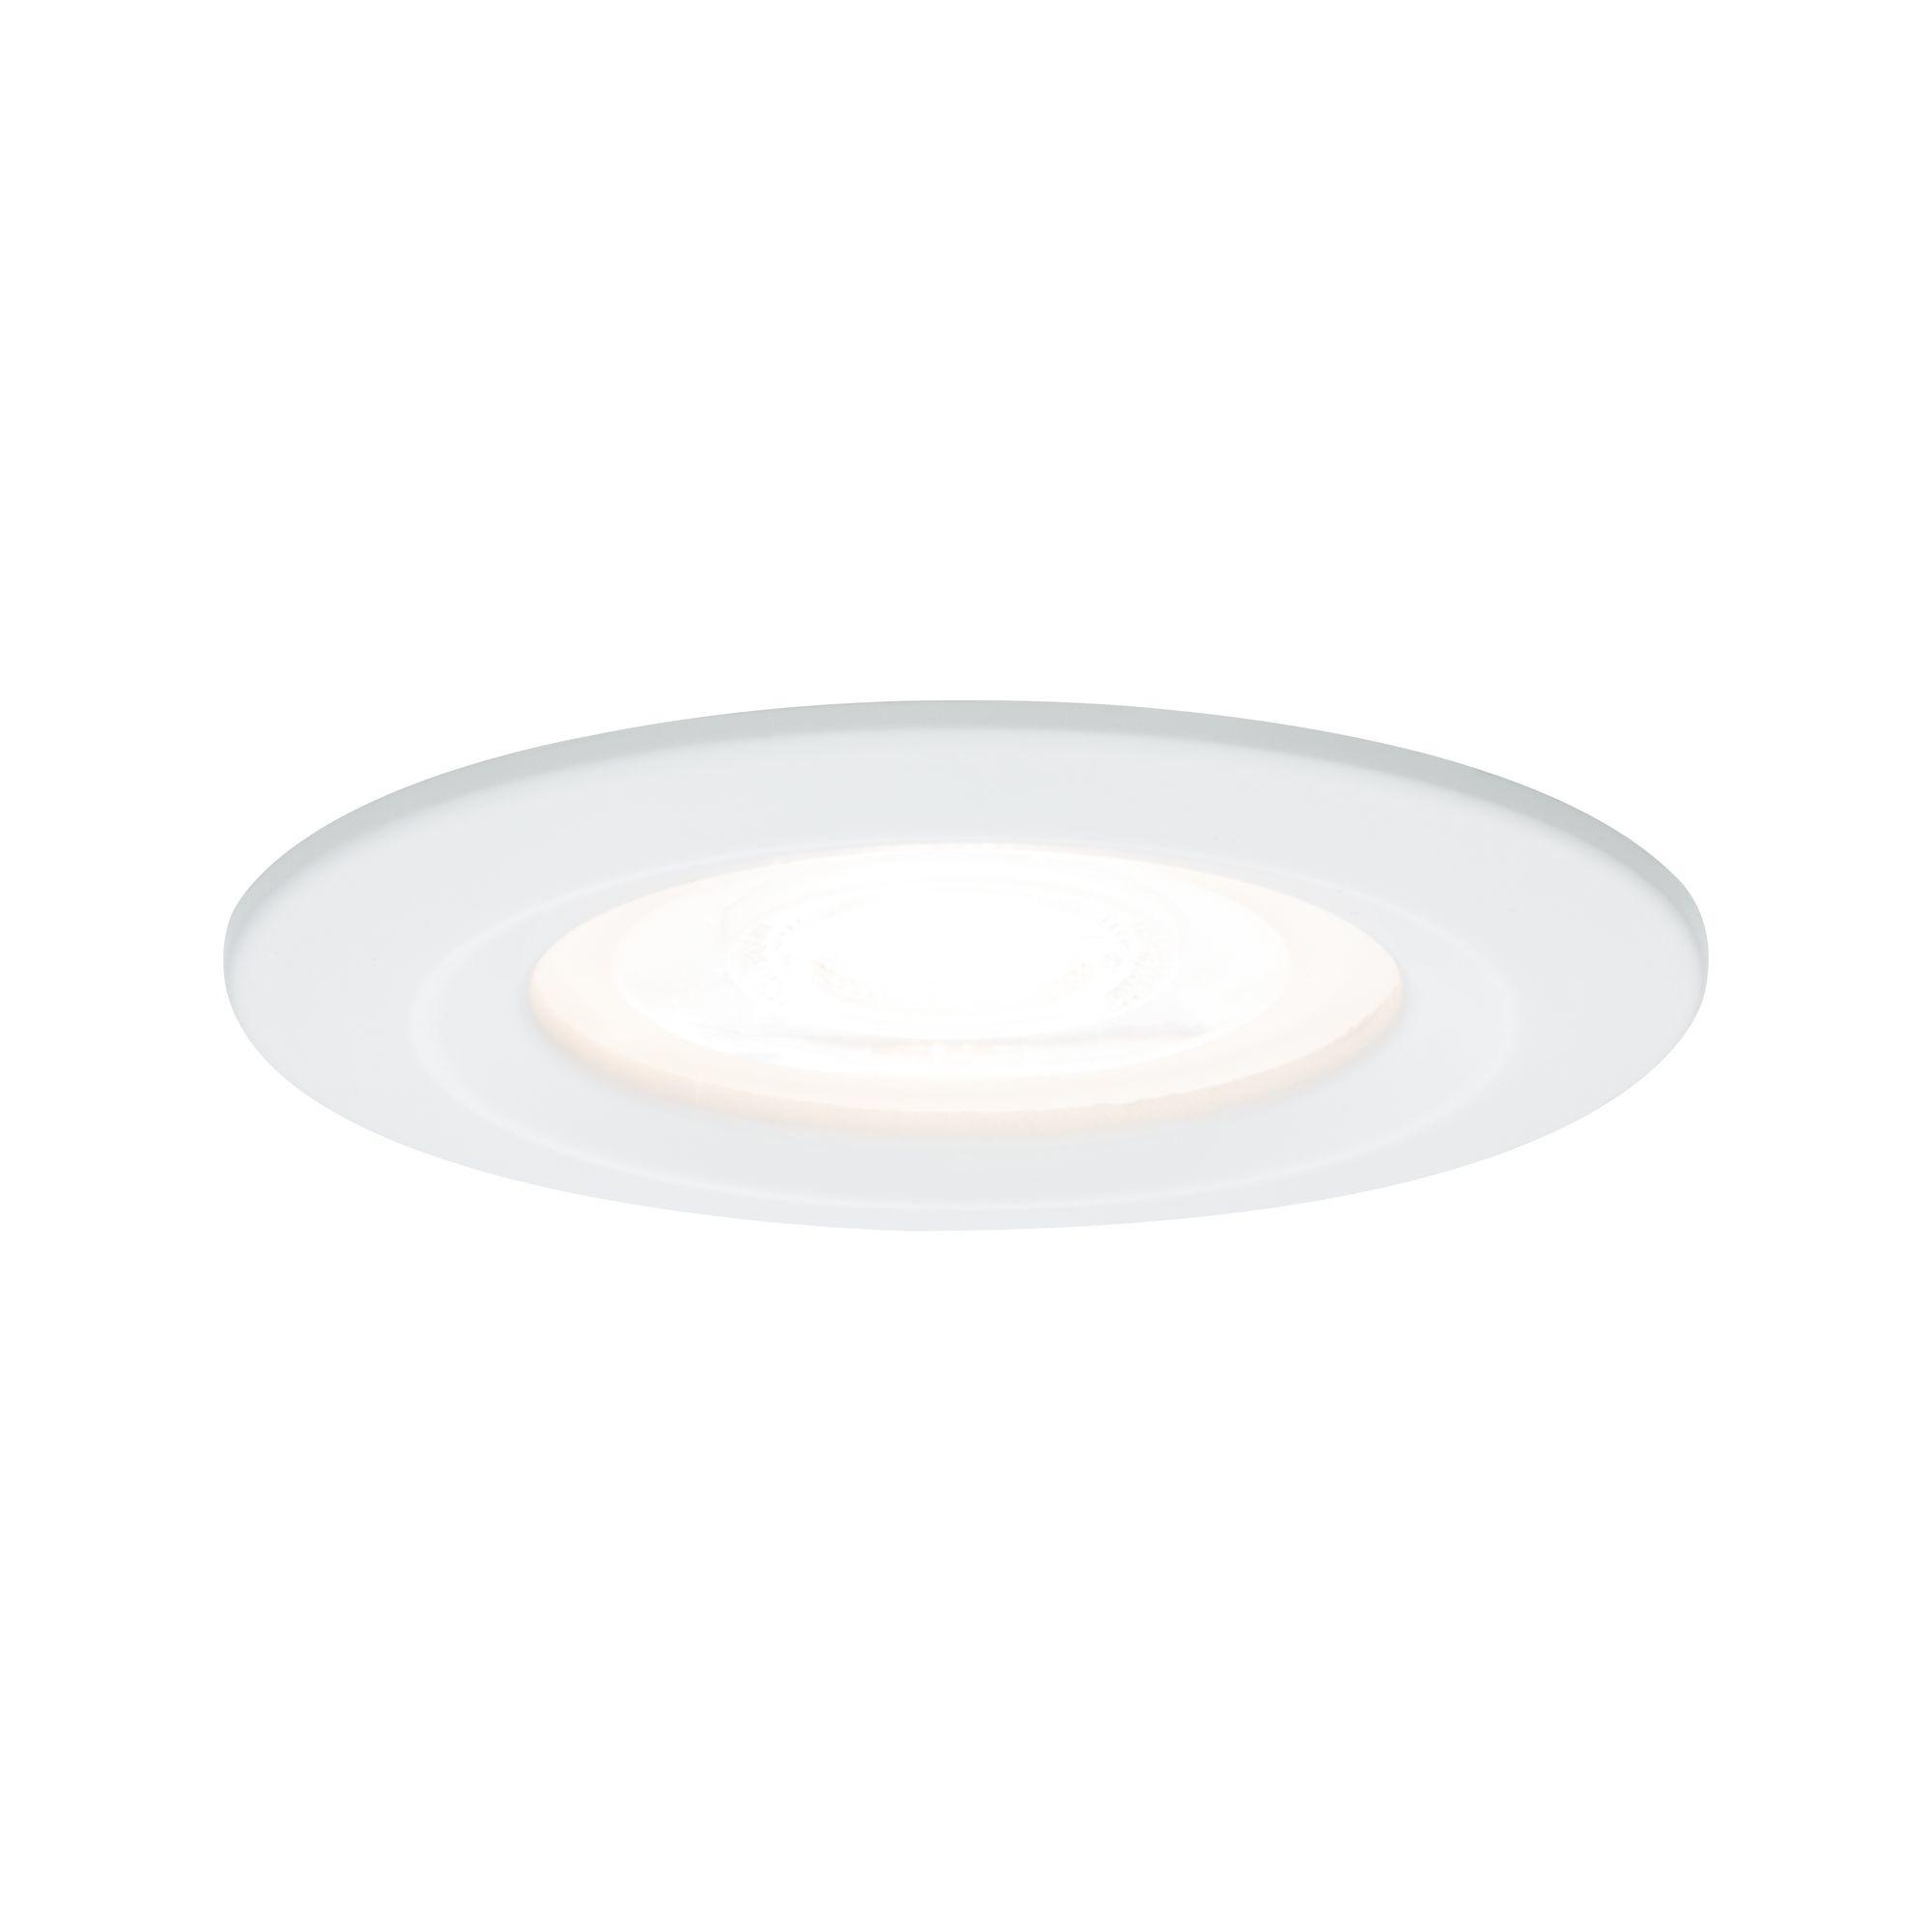 Paulmann EBL Set Nova rd starr LED IP44 3-stepdim1x6,5W 230V GU10 51mm Weiß matt/Alu